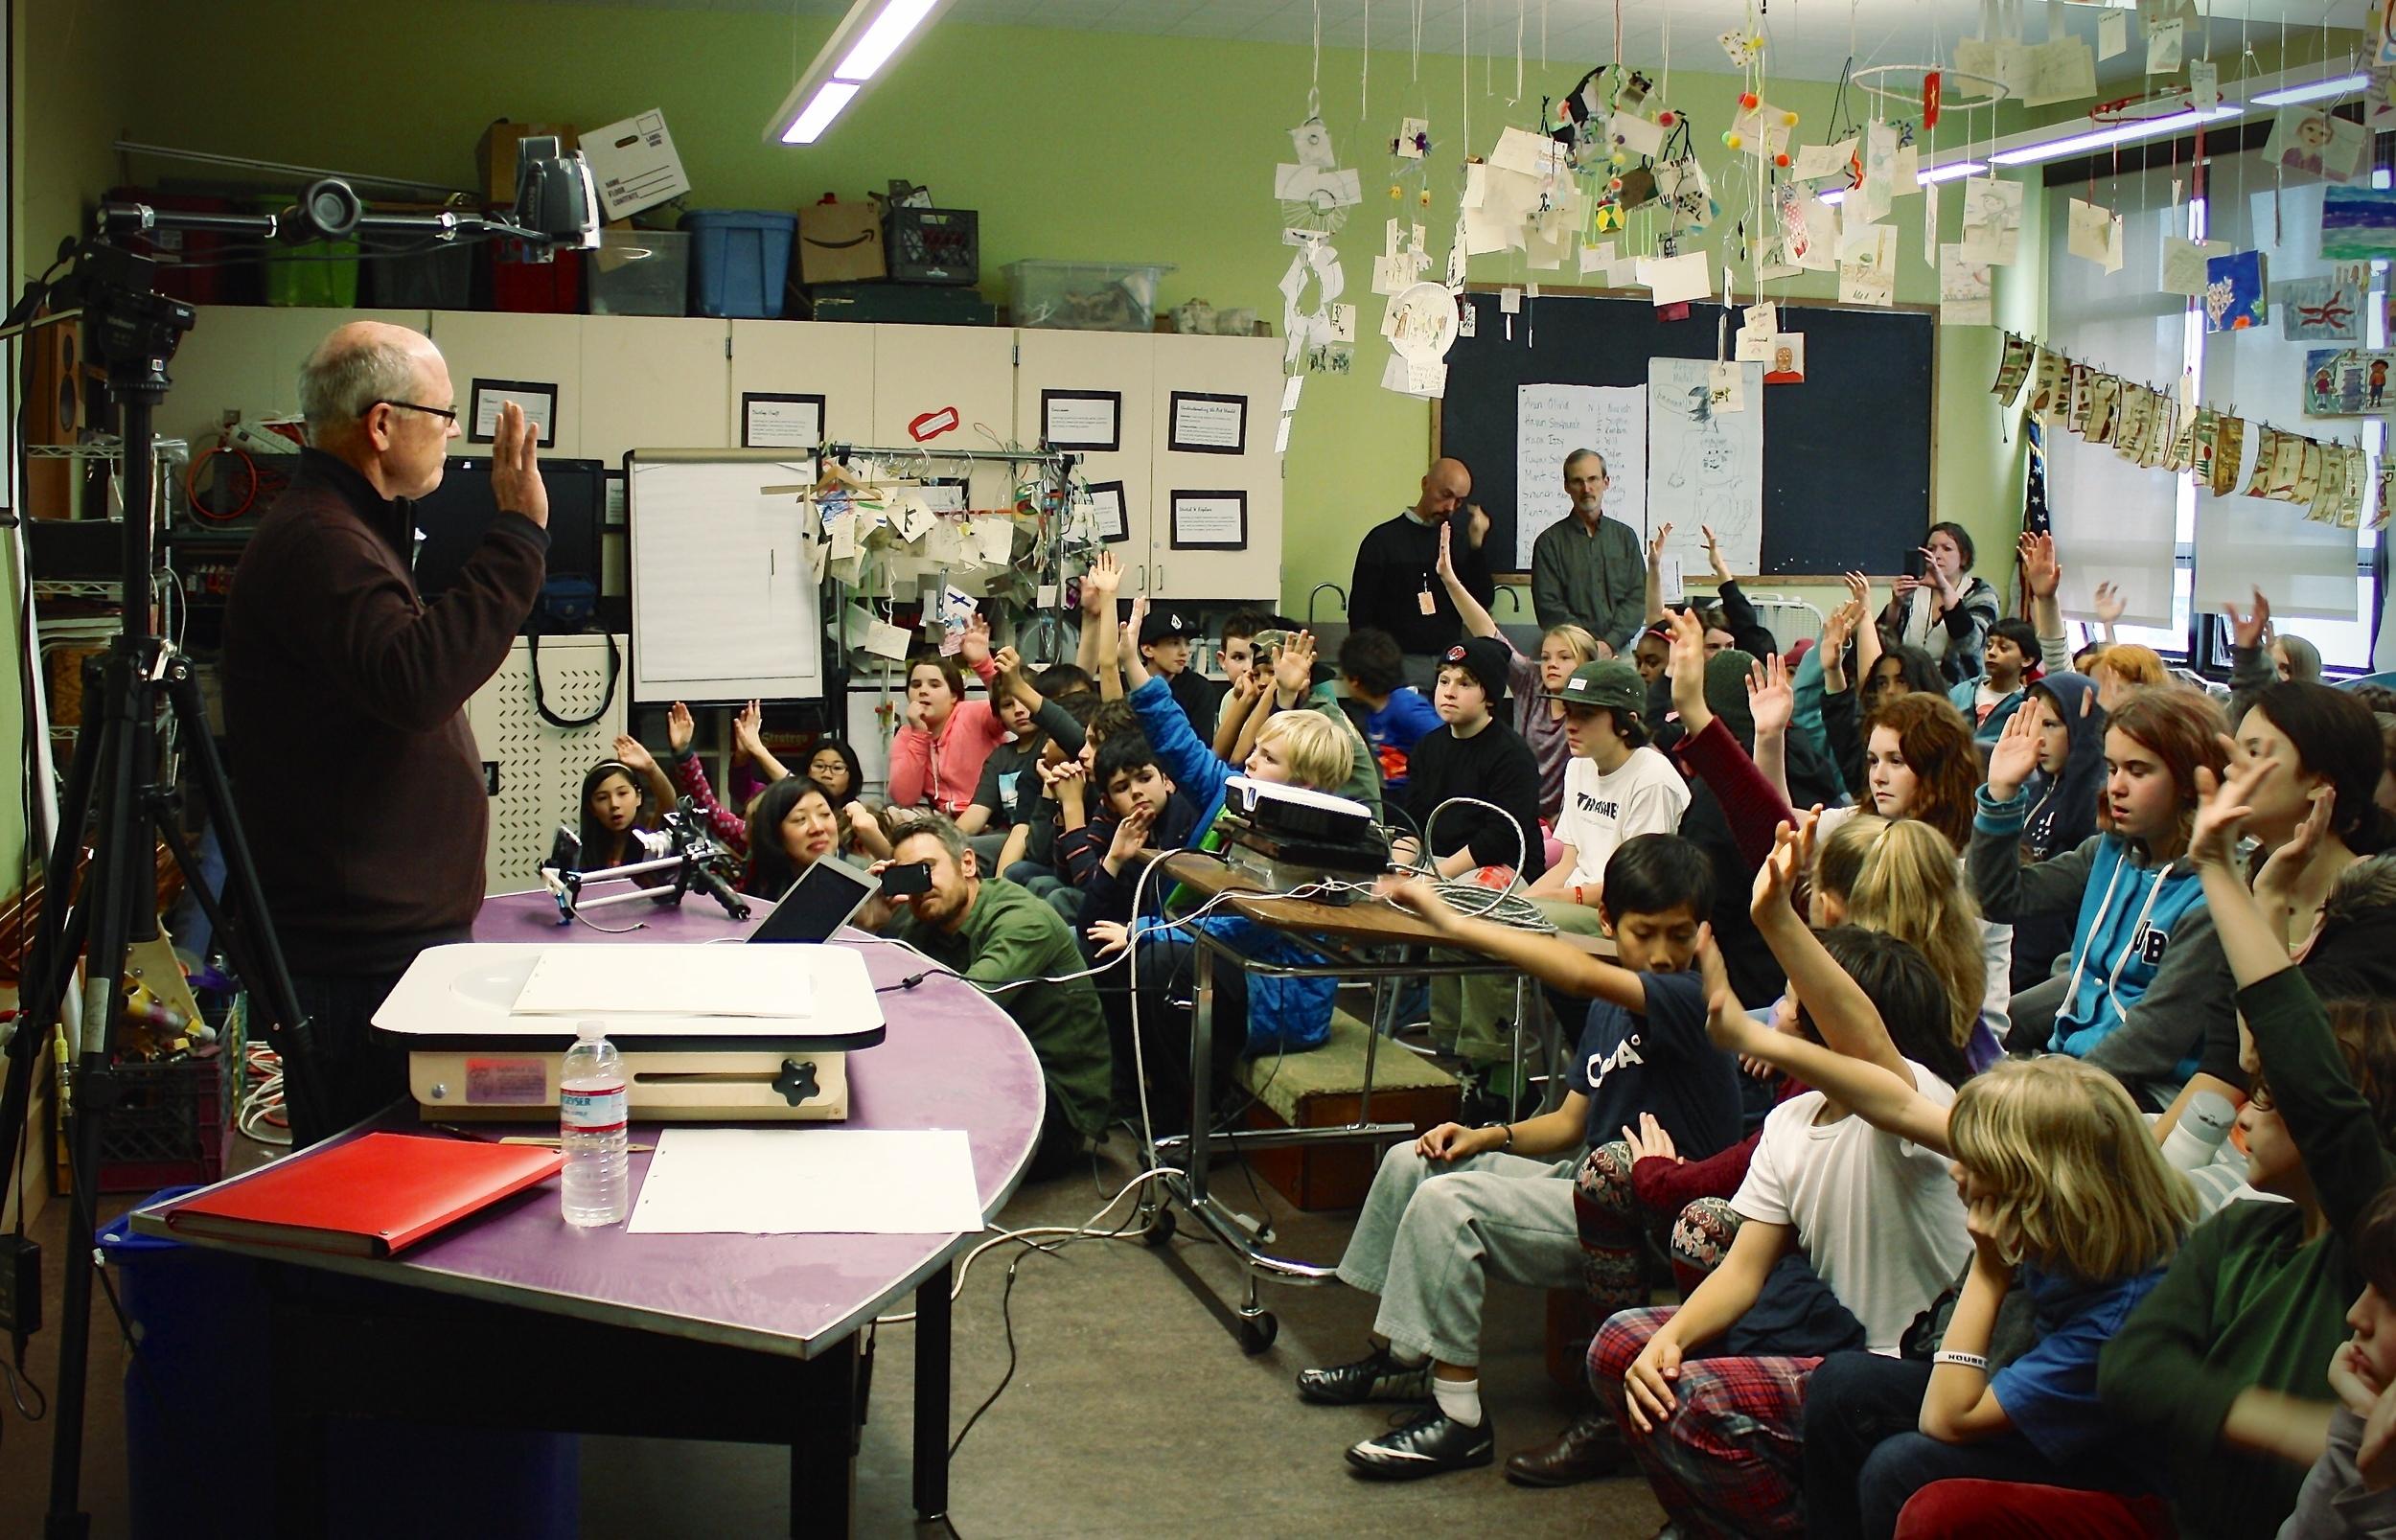 Animator Glen Keane quizzing localstudents. Photo by Julie Stallone.